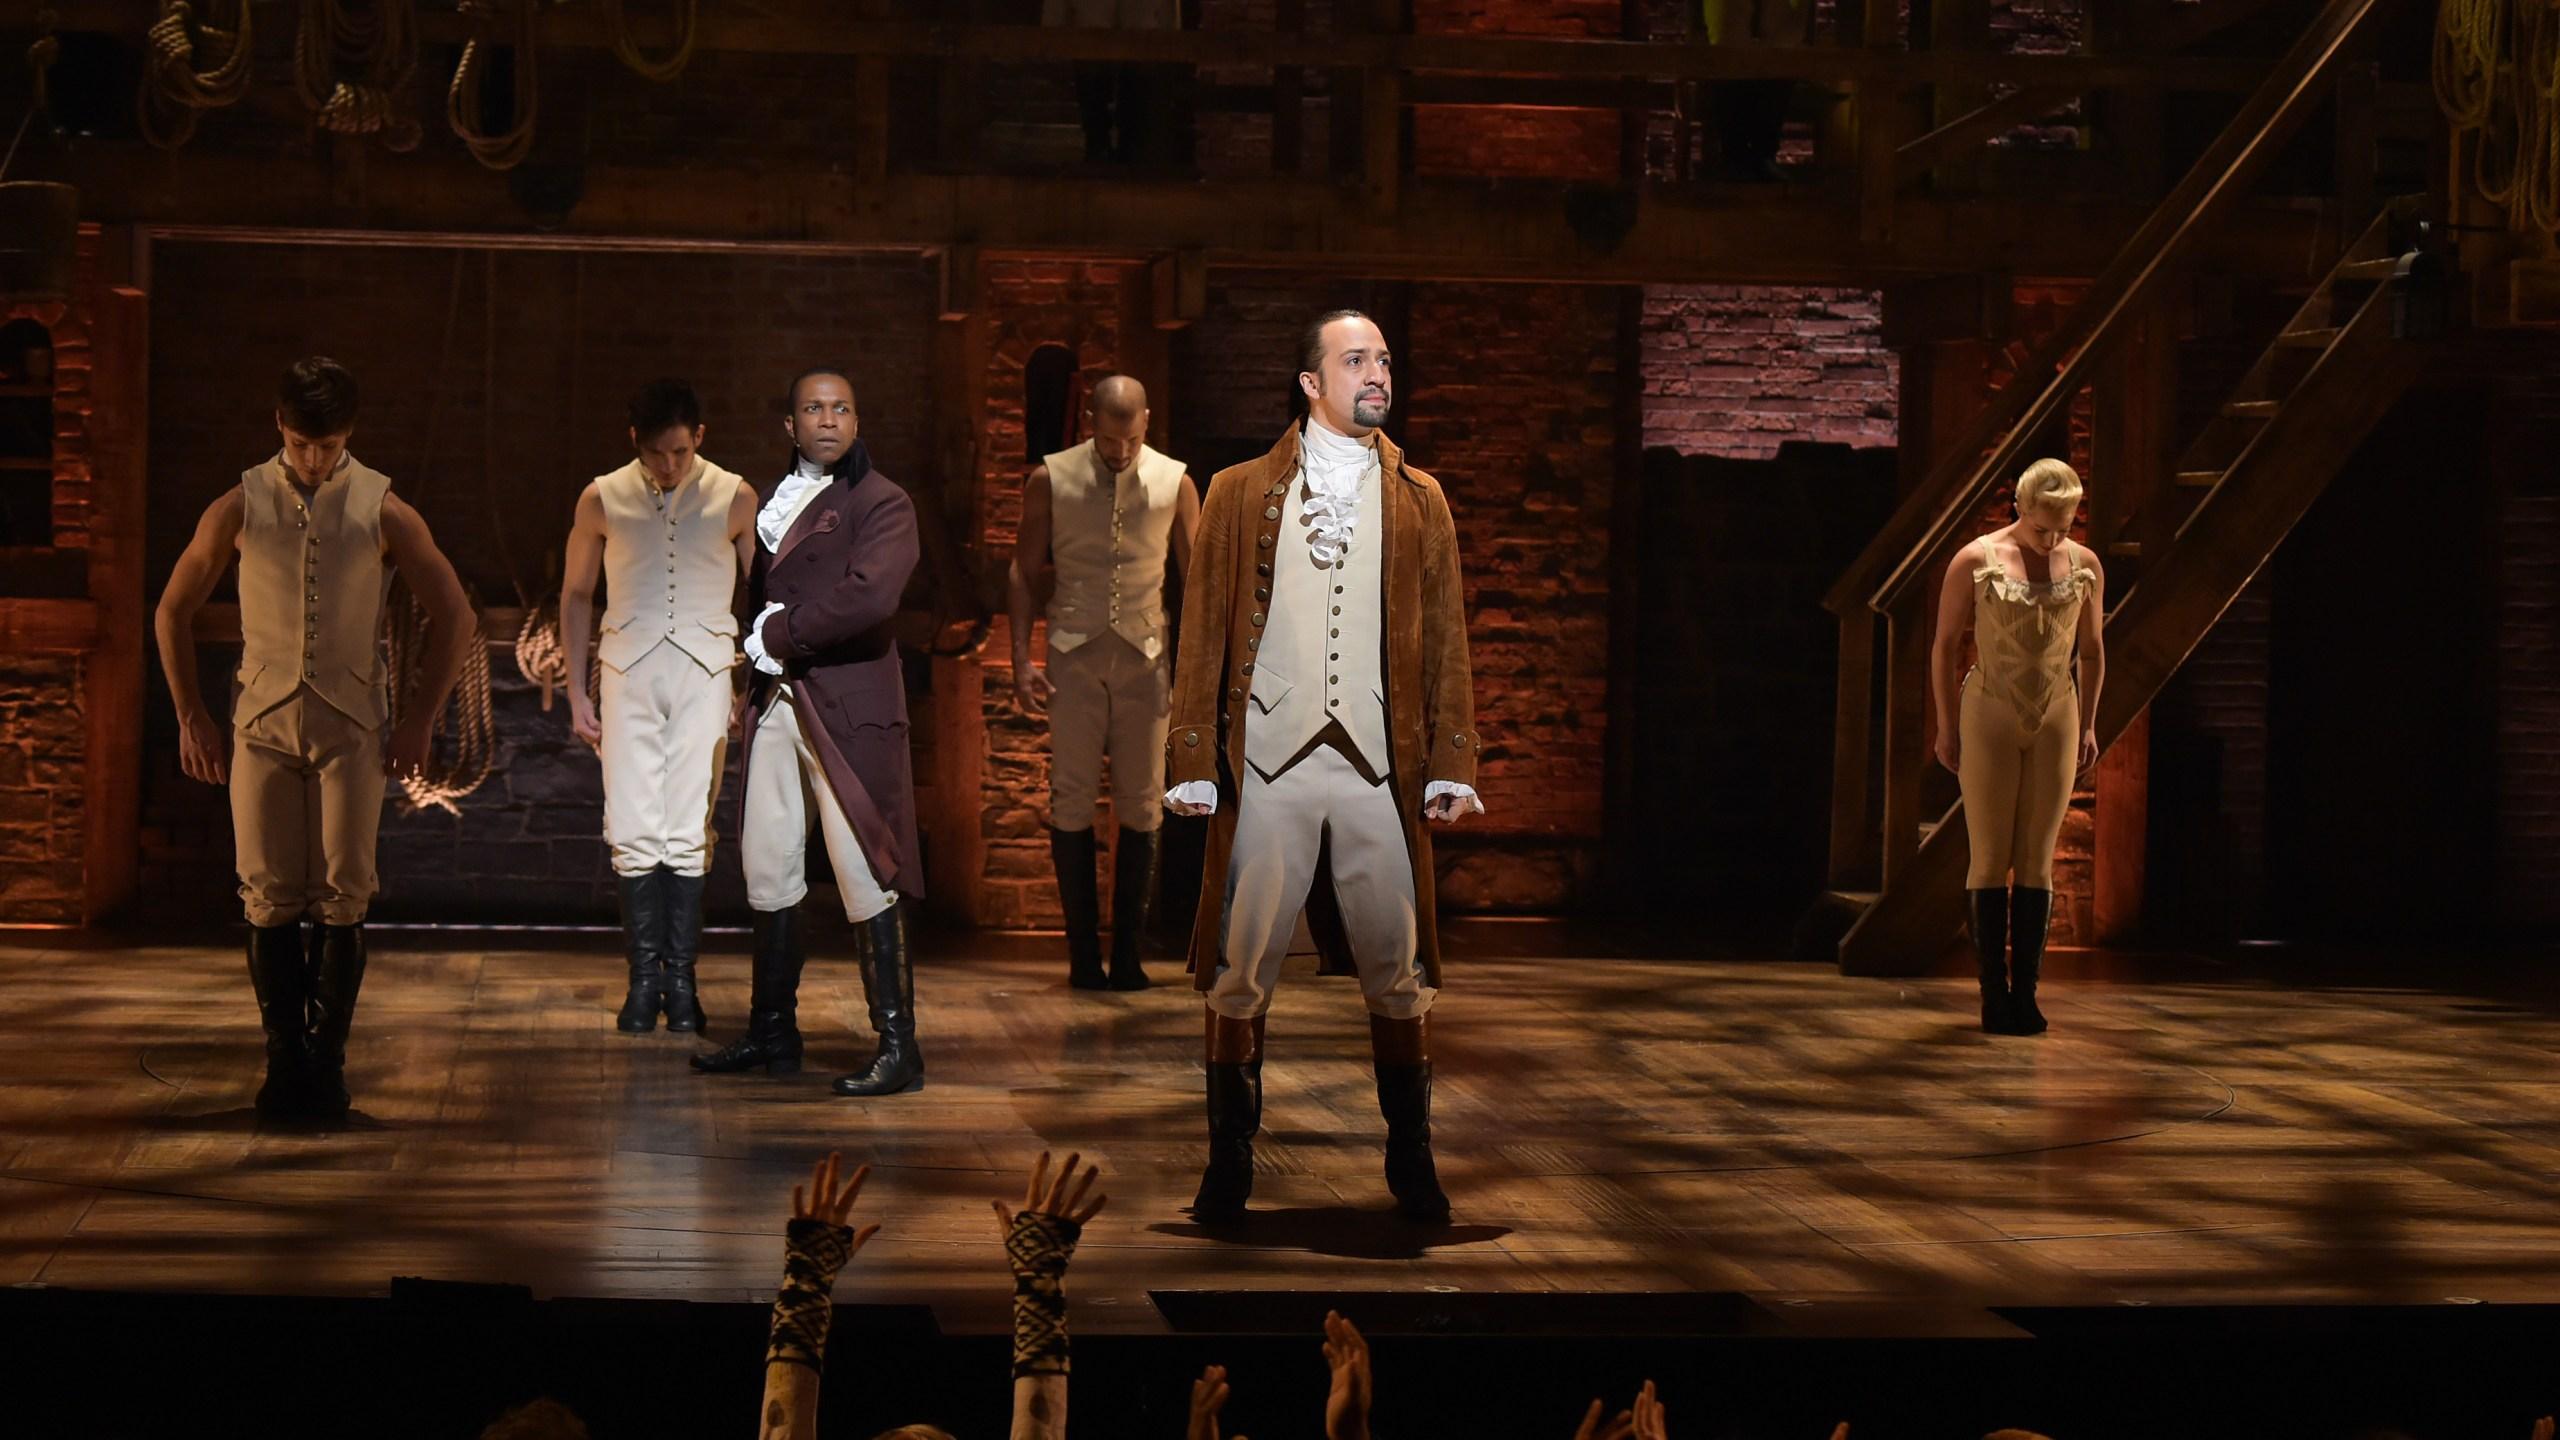 'Hamilton' Broadway show